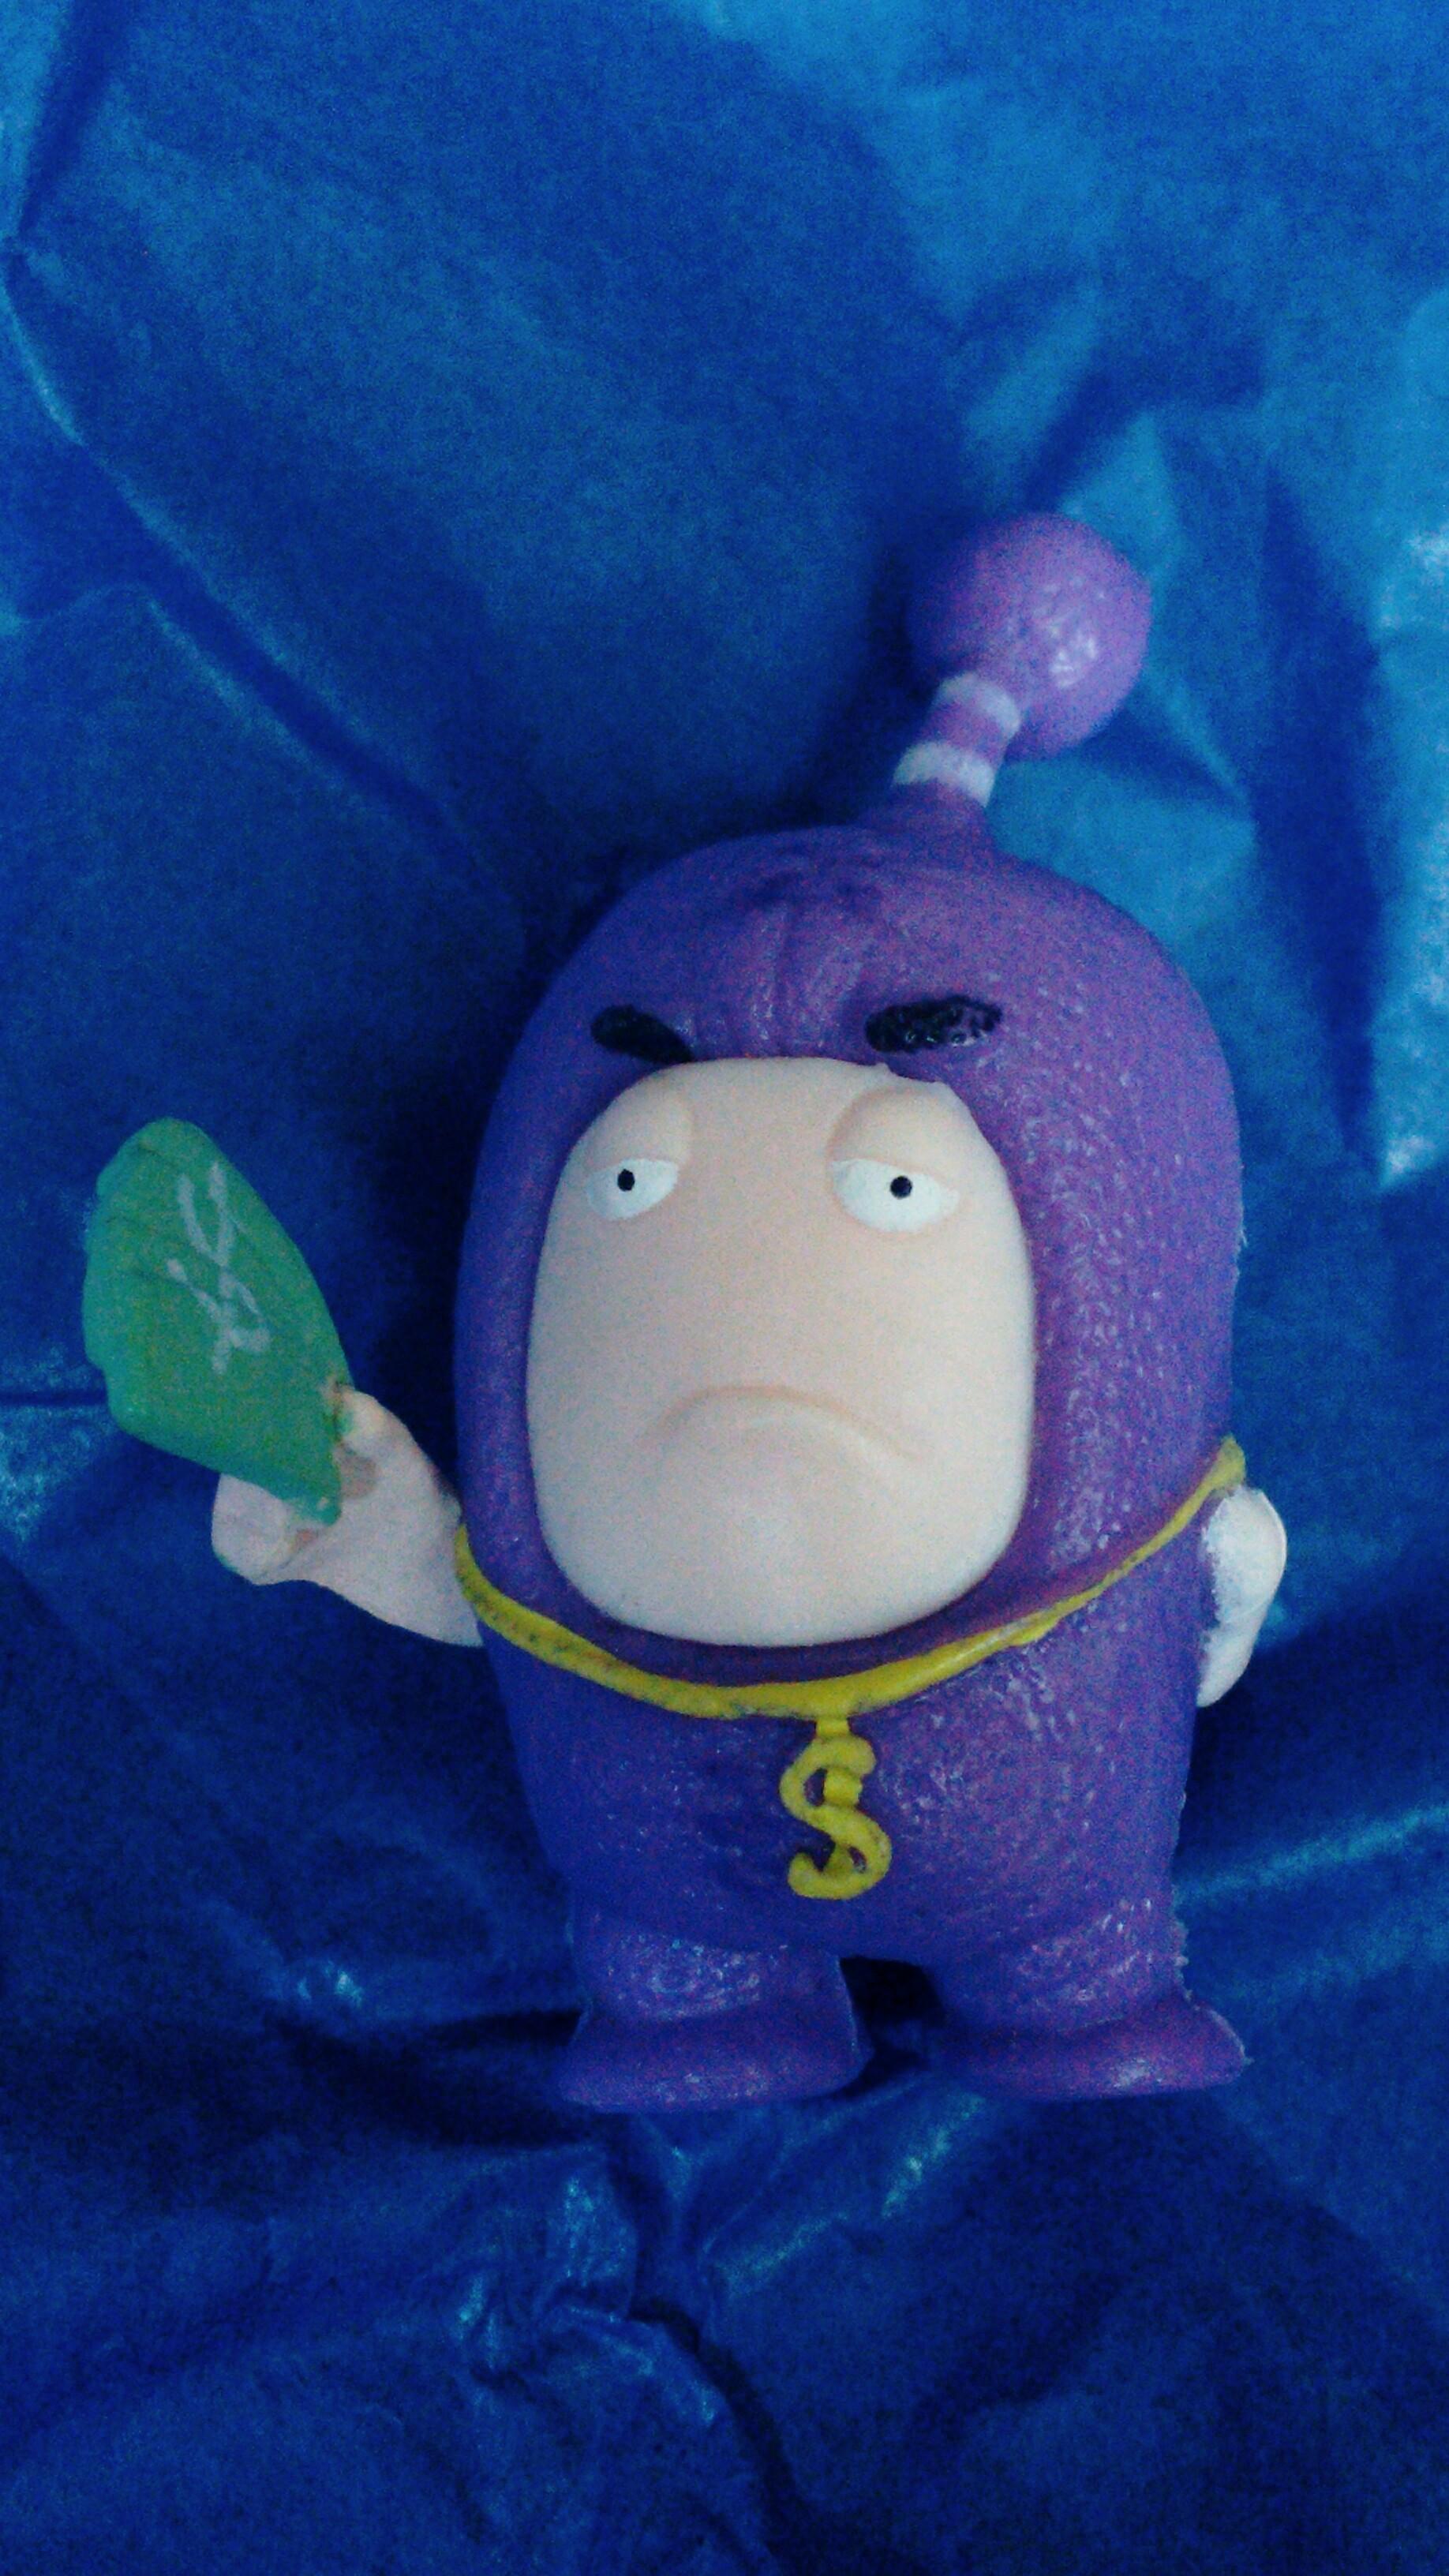 Oddbods toy stocking filler